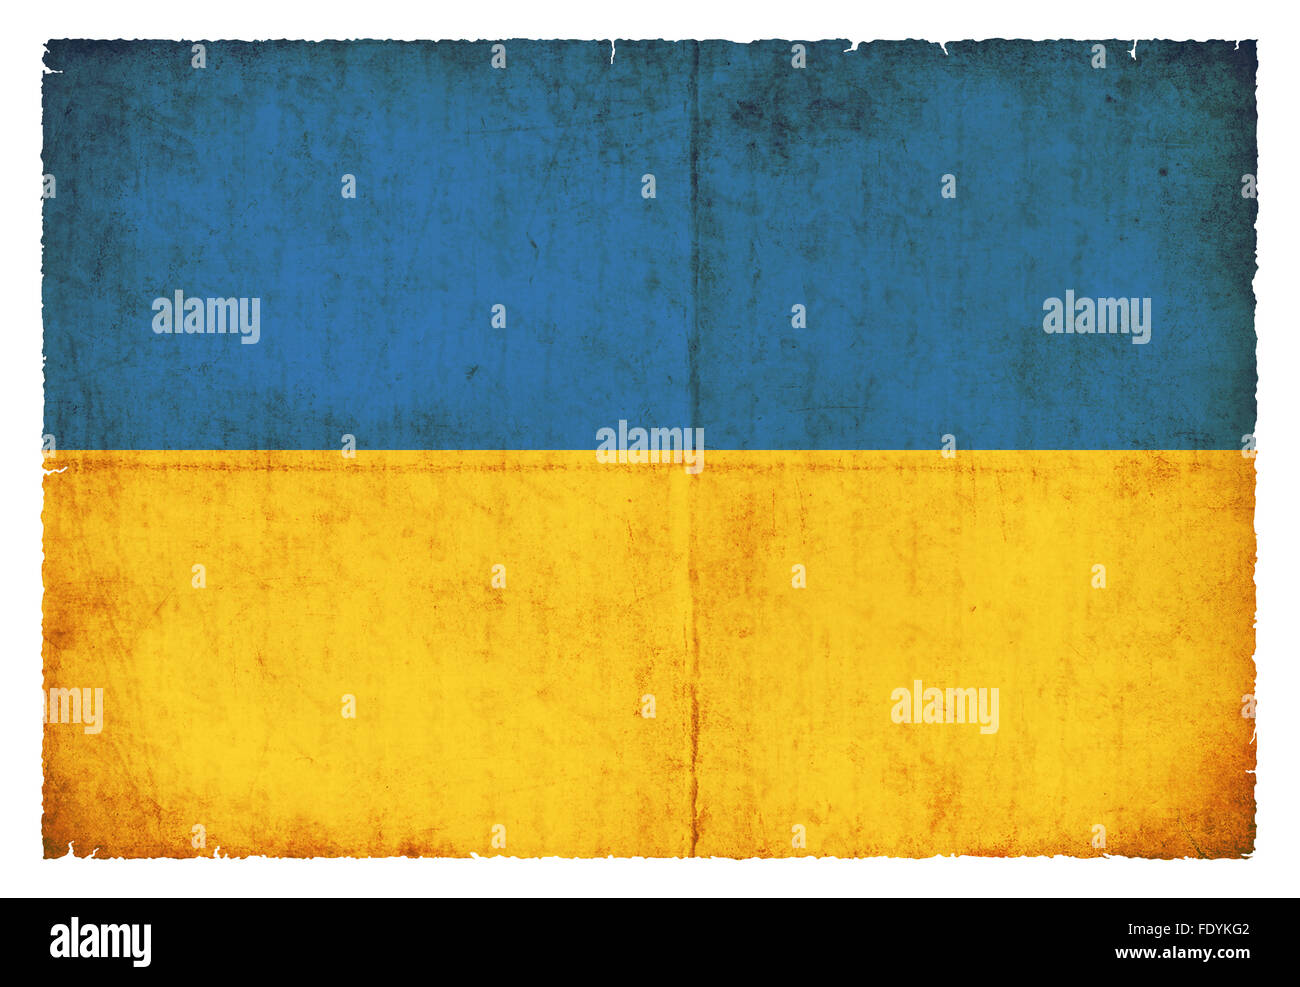 National Flag of Ukraine created in grunge style - Stock Image